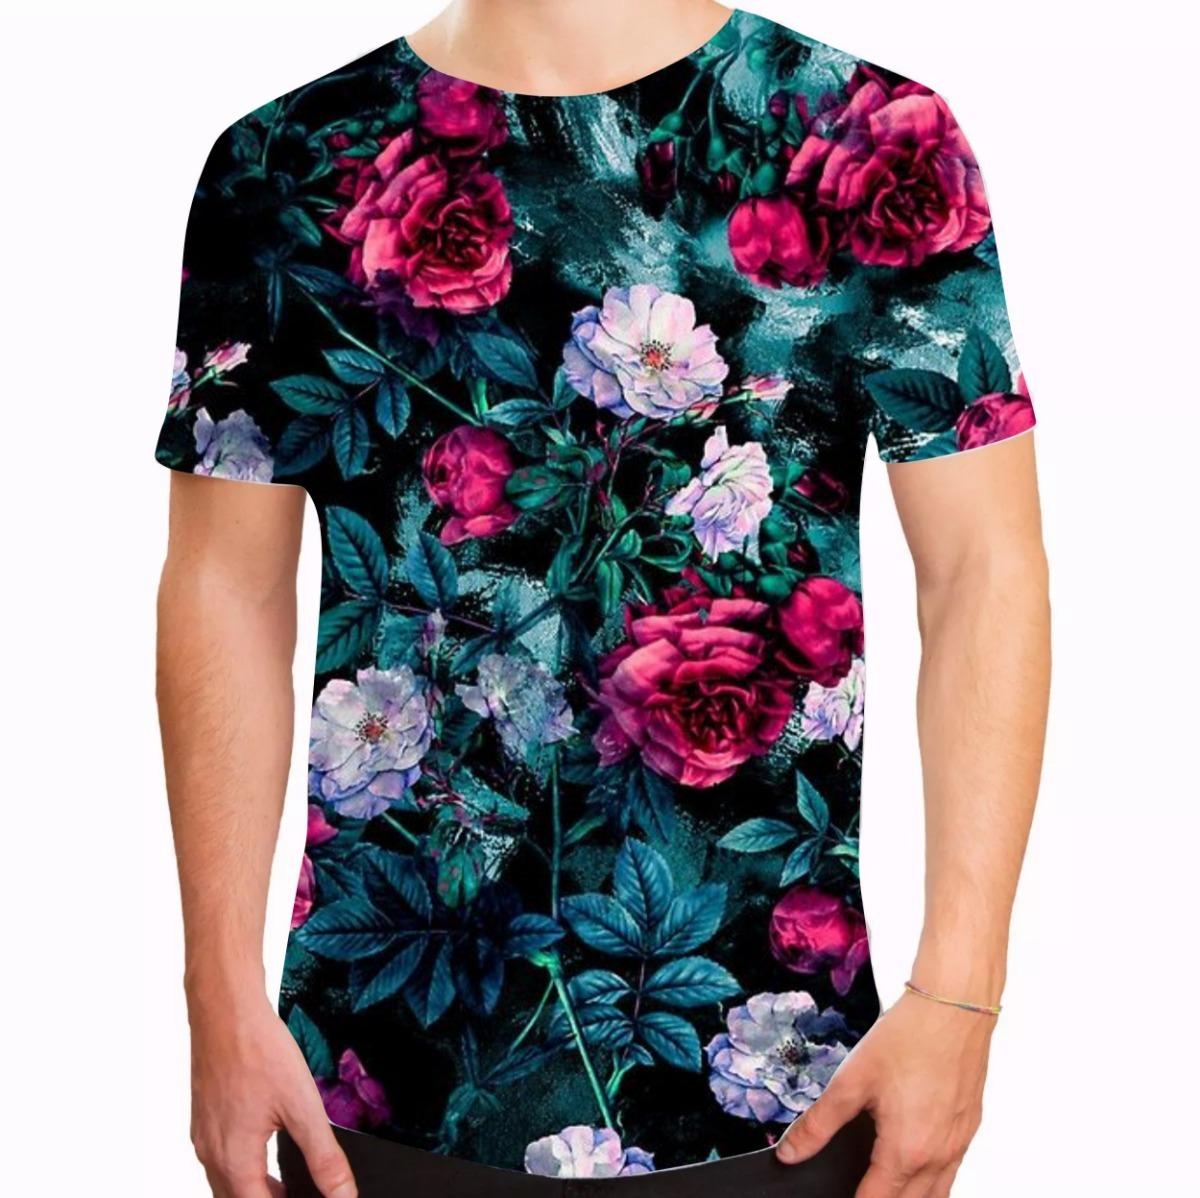 e019e0dbdc camiseta masculina longline swag floral moda 2018 florida. Carregando zoom.